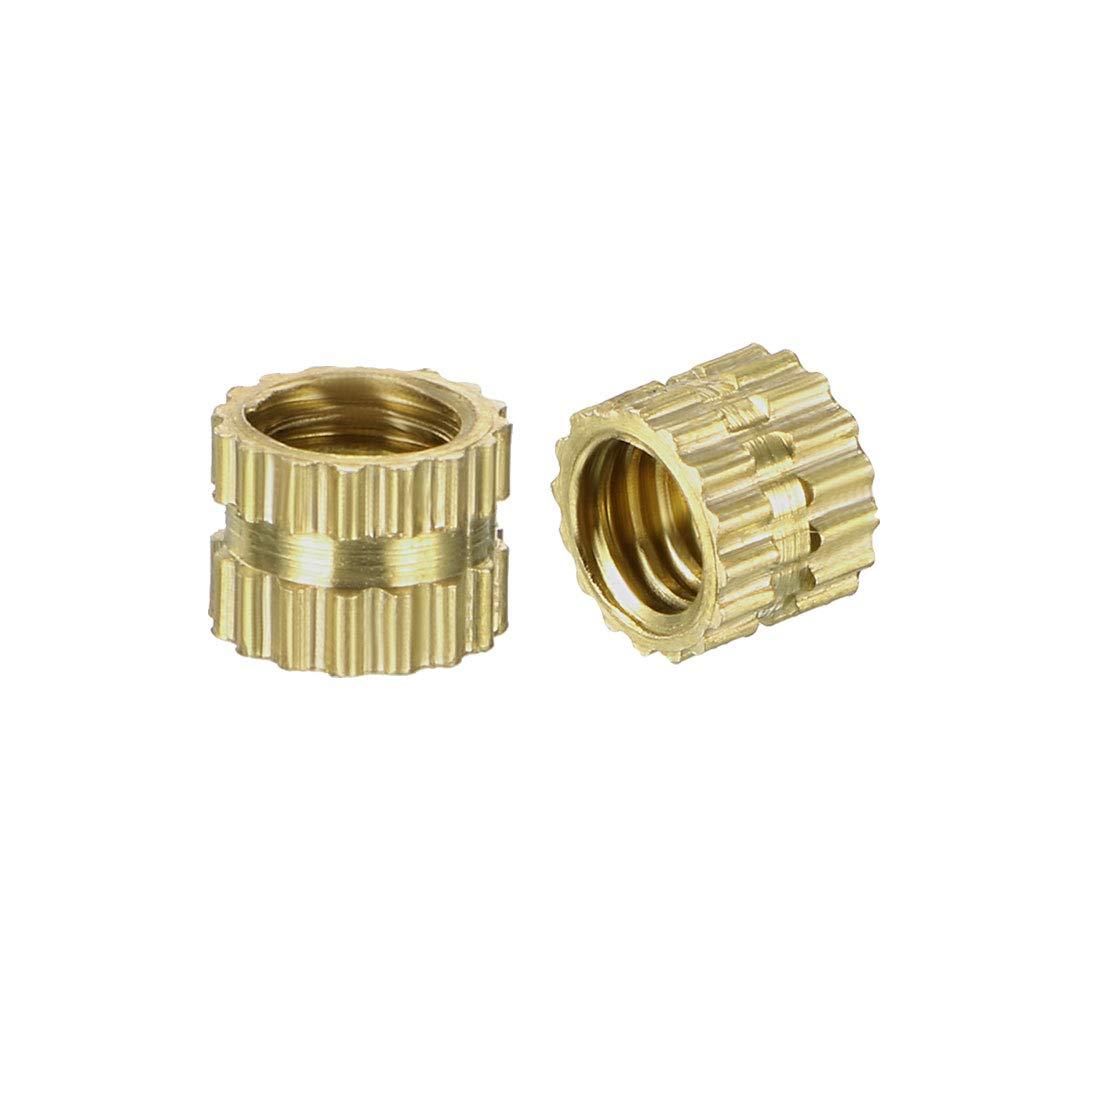 Pack of 100 x 8.5mm OD M6 x 12mm Female Thread Brass Embedment Nuts L uxcell Knurled Threaded Insert